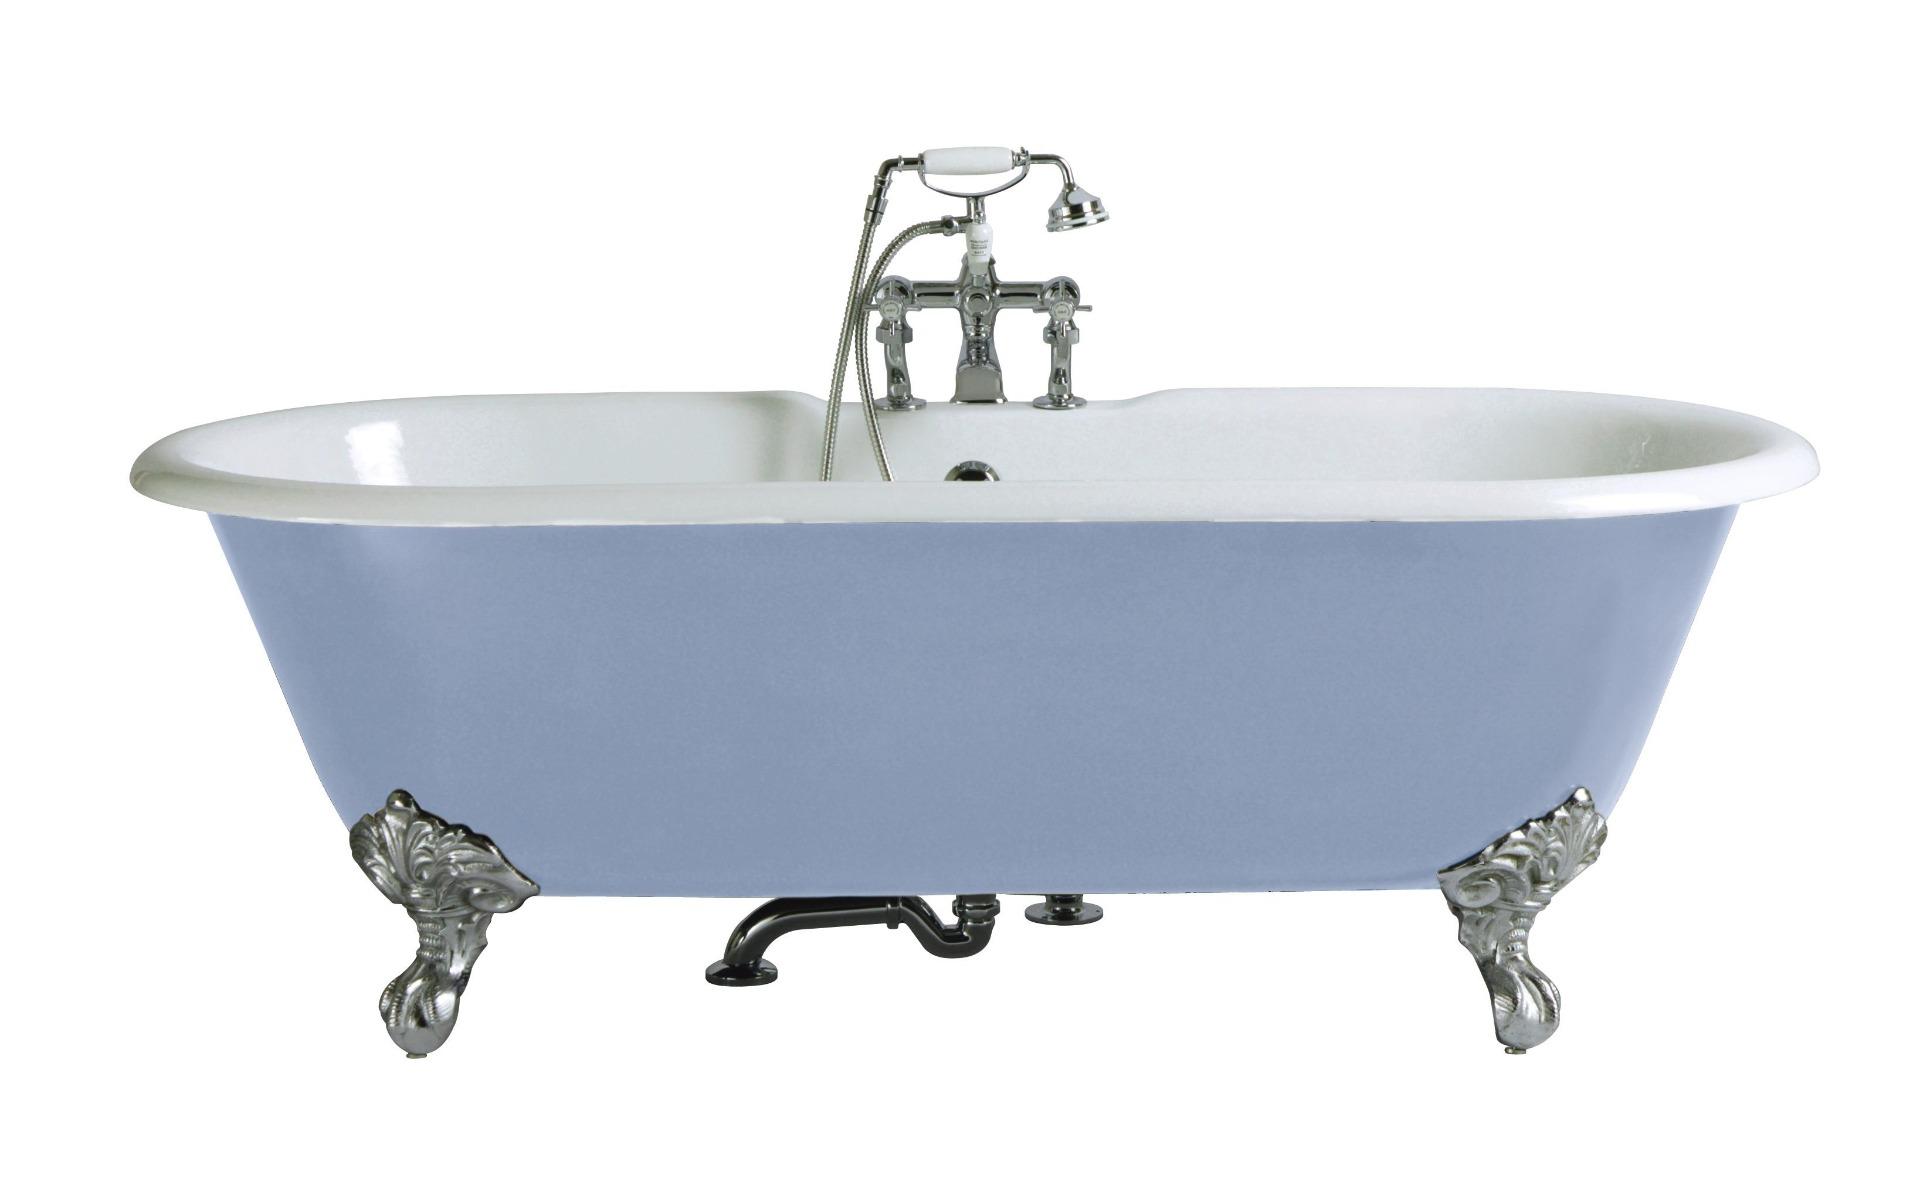 https://www.ukbathroomstore.co.uk/media/catalog/product/b/r/brt79.jpg